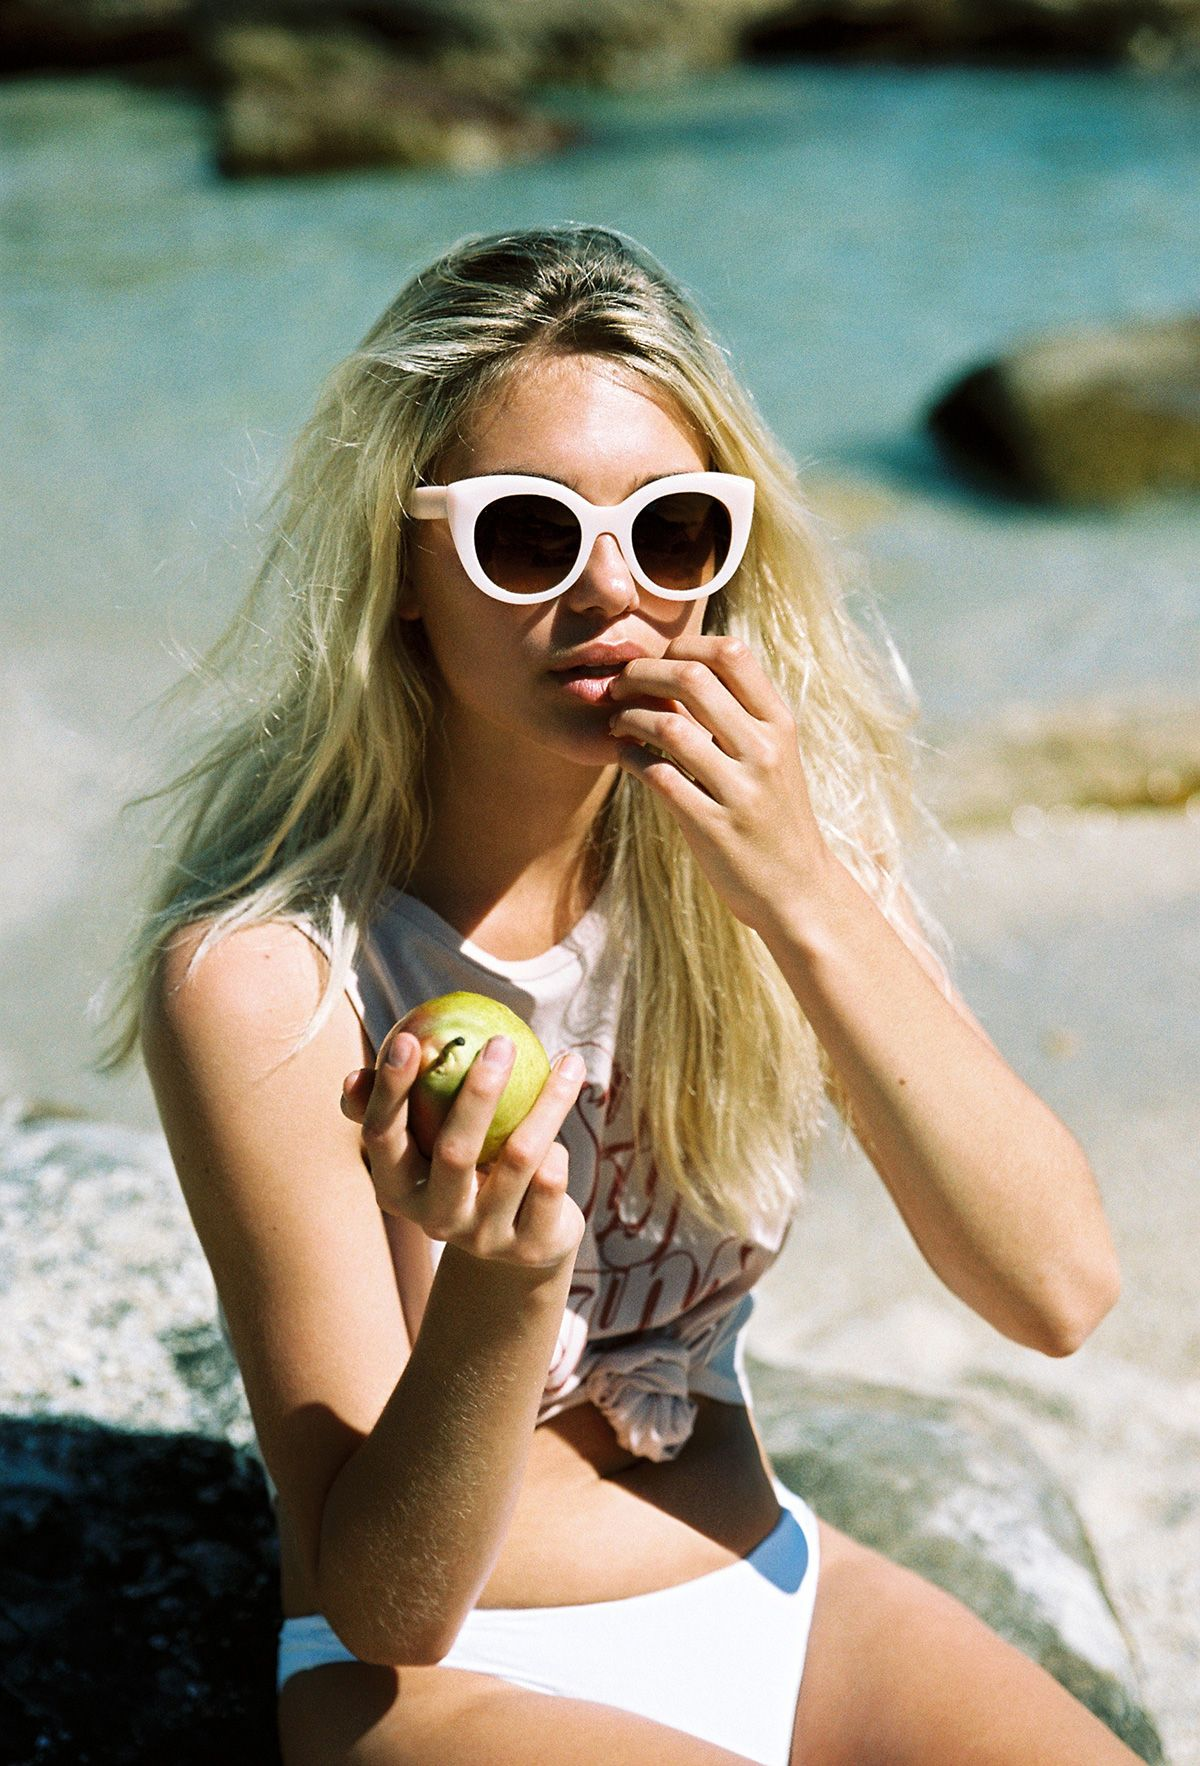 d36ee71ff0089 AMUSE X D BLANC   The Modern Lover Sunglasses in Blush. Danika Pienaar  photographed